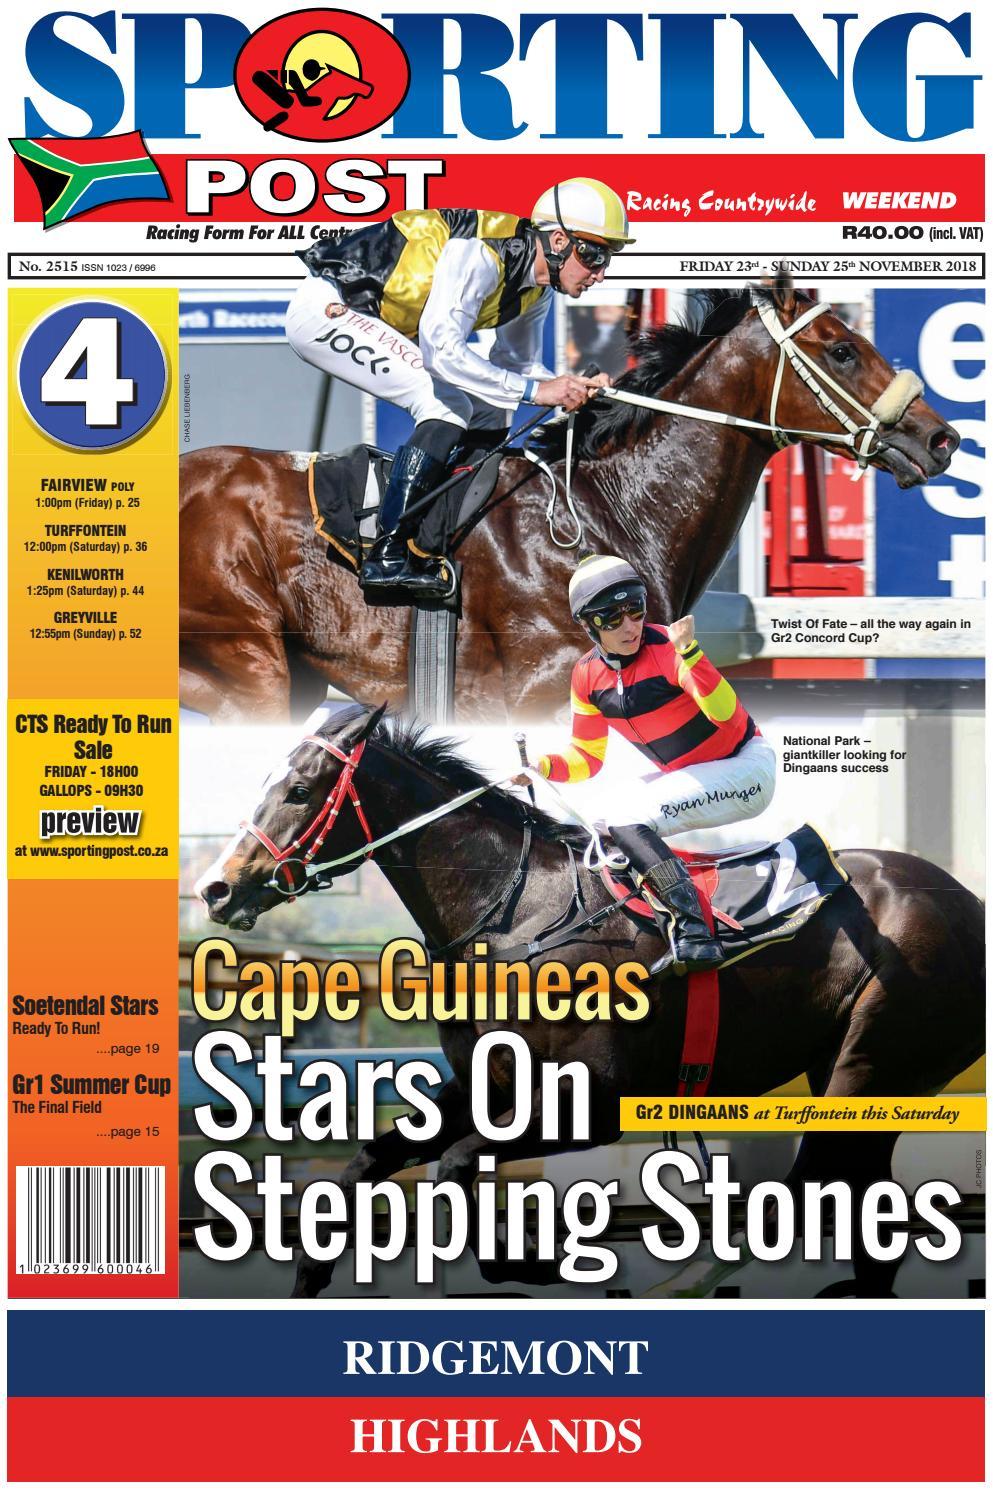 23-25 Nov #2515 Sporting Post by Sporting Post - issuu